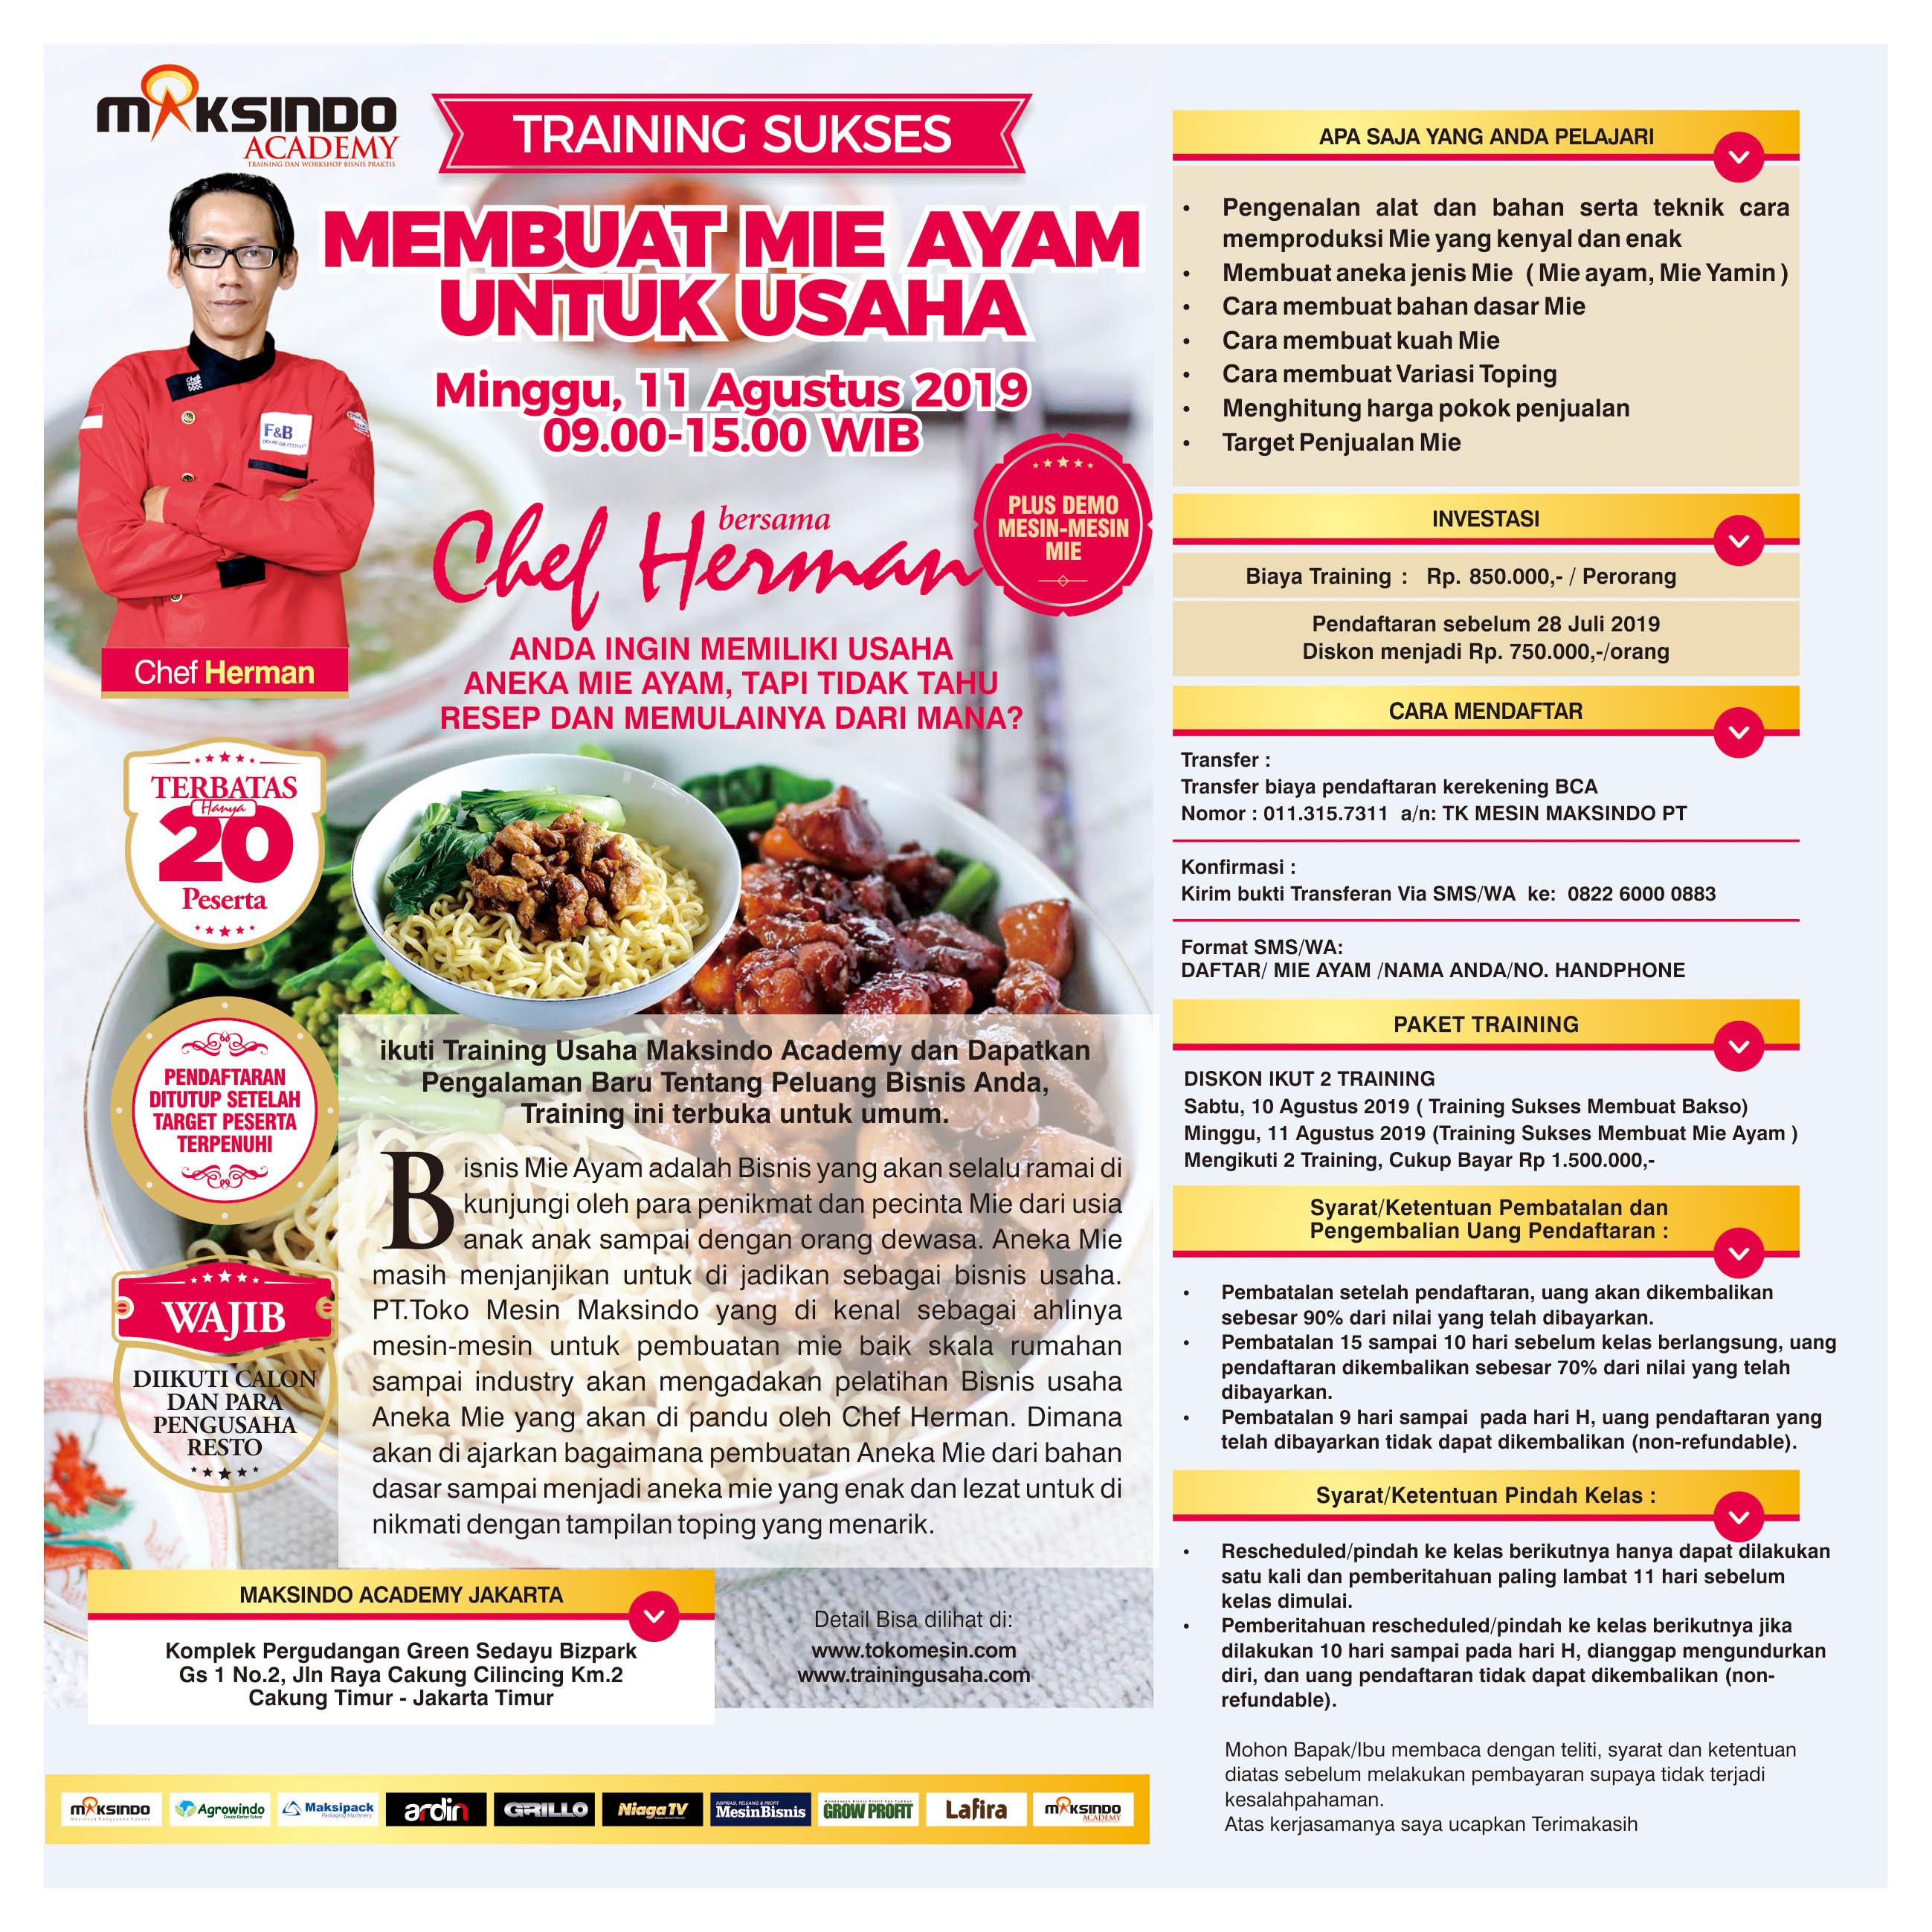 Training Sukses Membuat Mie Ayam, Minggu 11 Agustus 2019